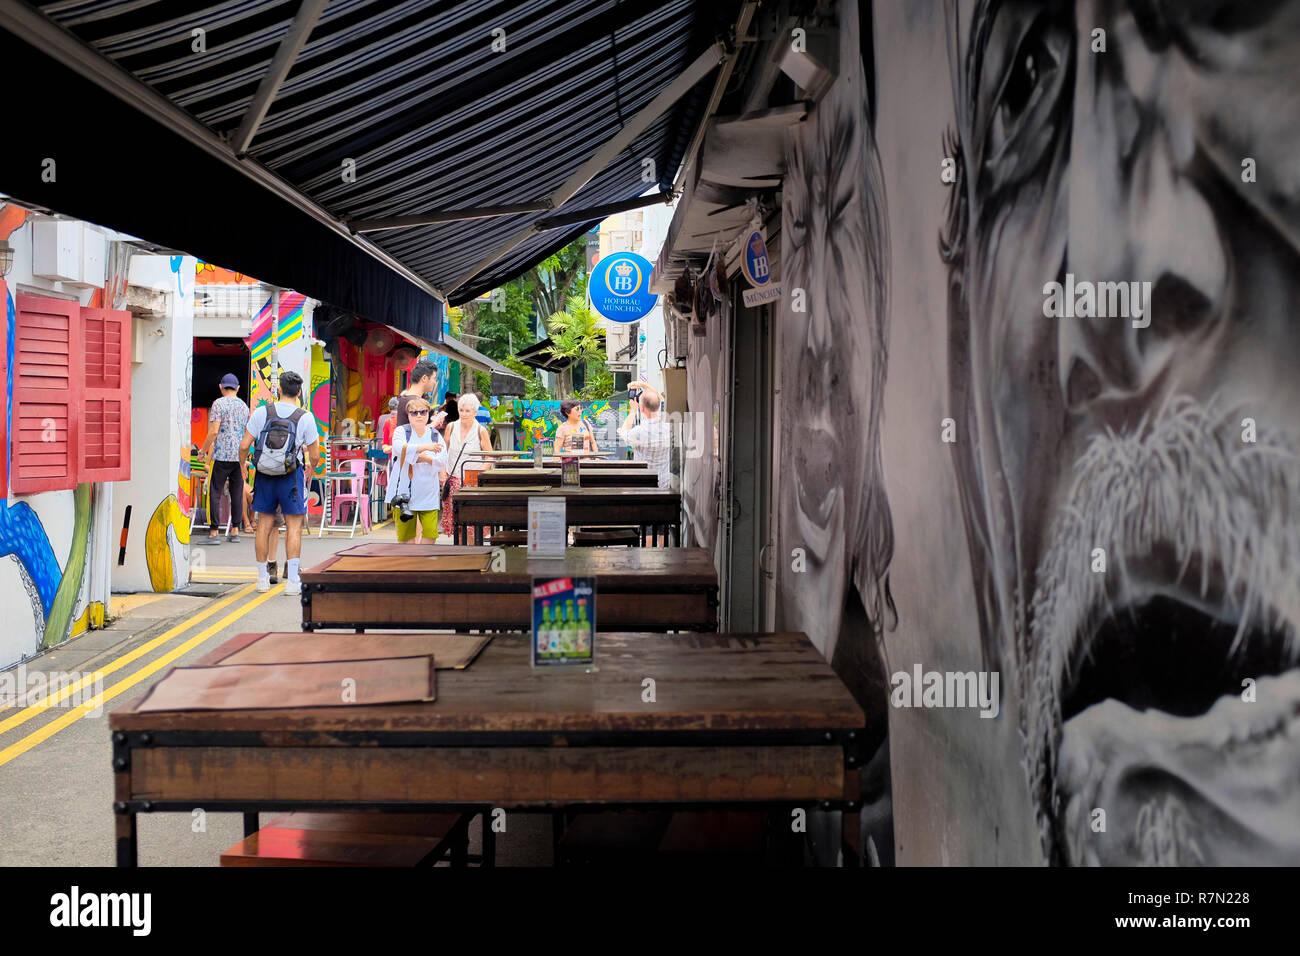 Haji Lane, Kampong Glam, Singapore. - Stock Image